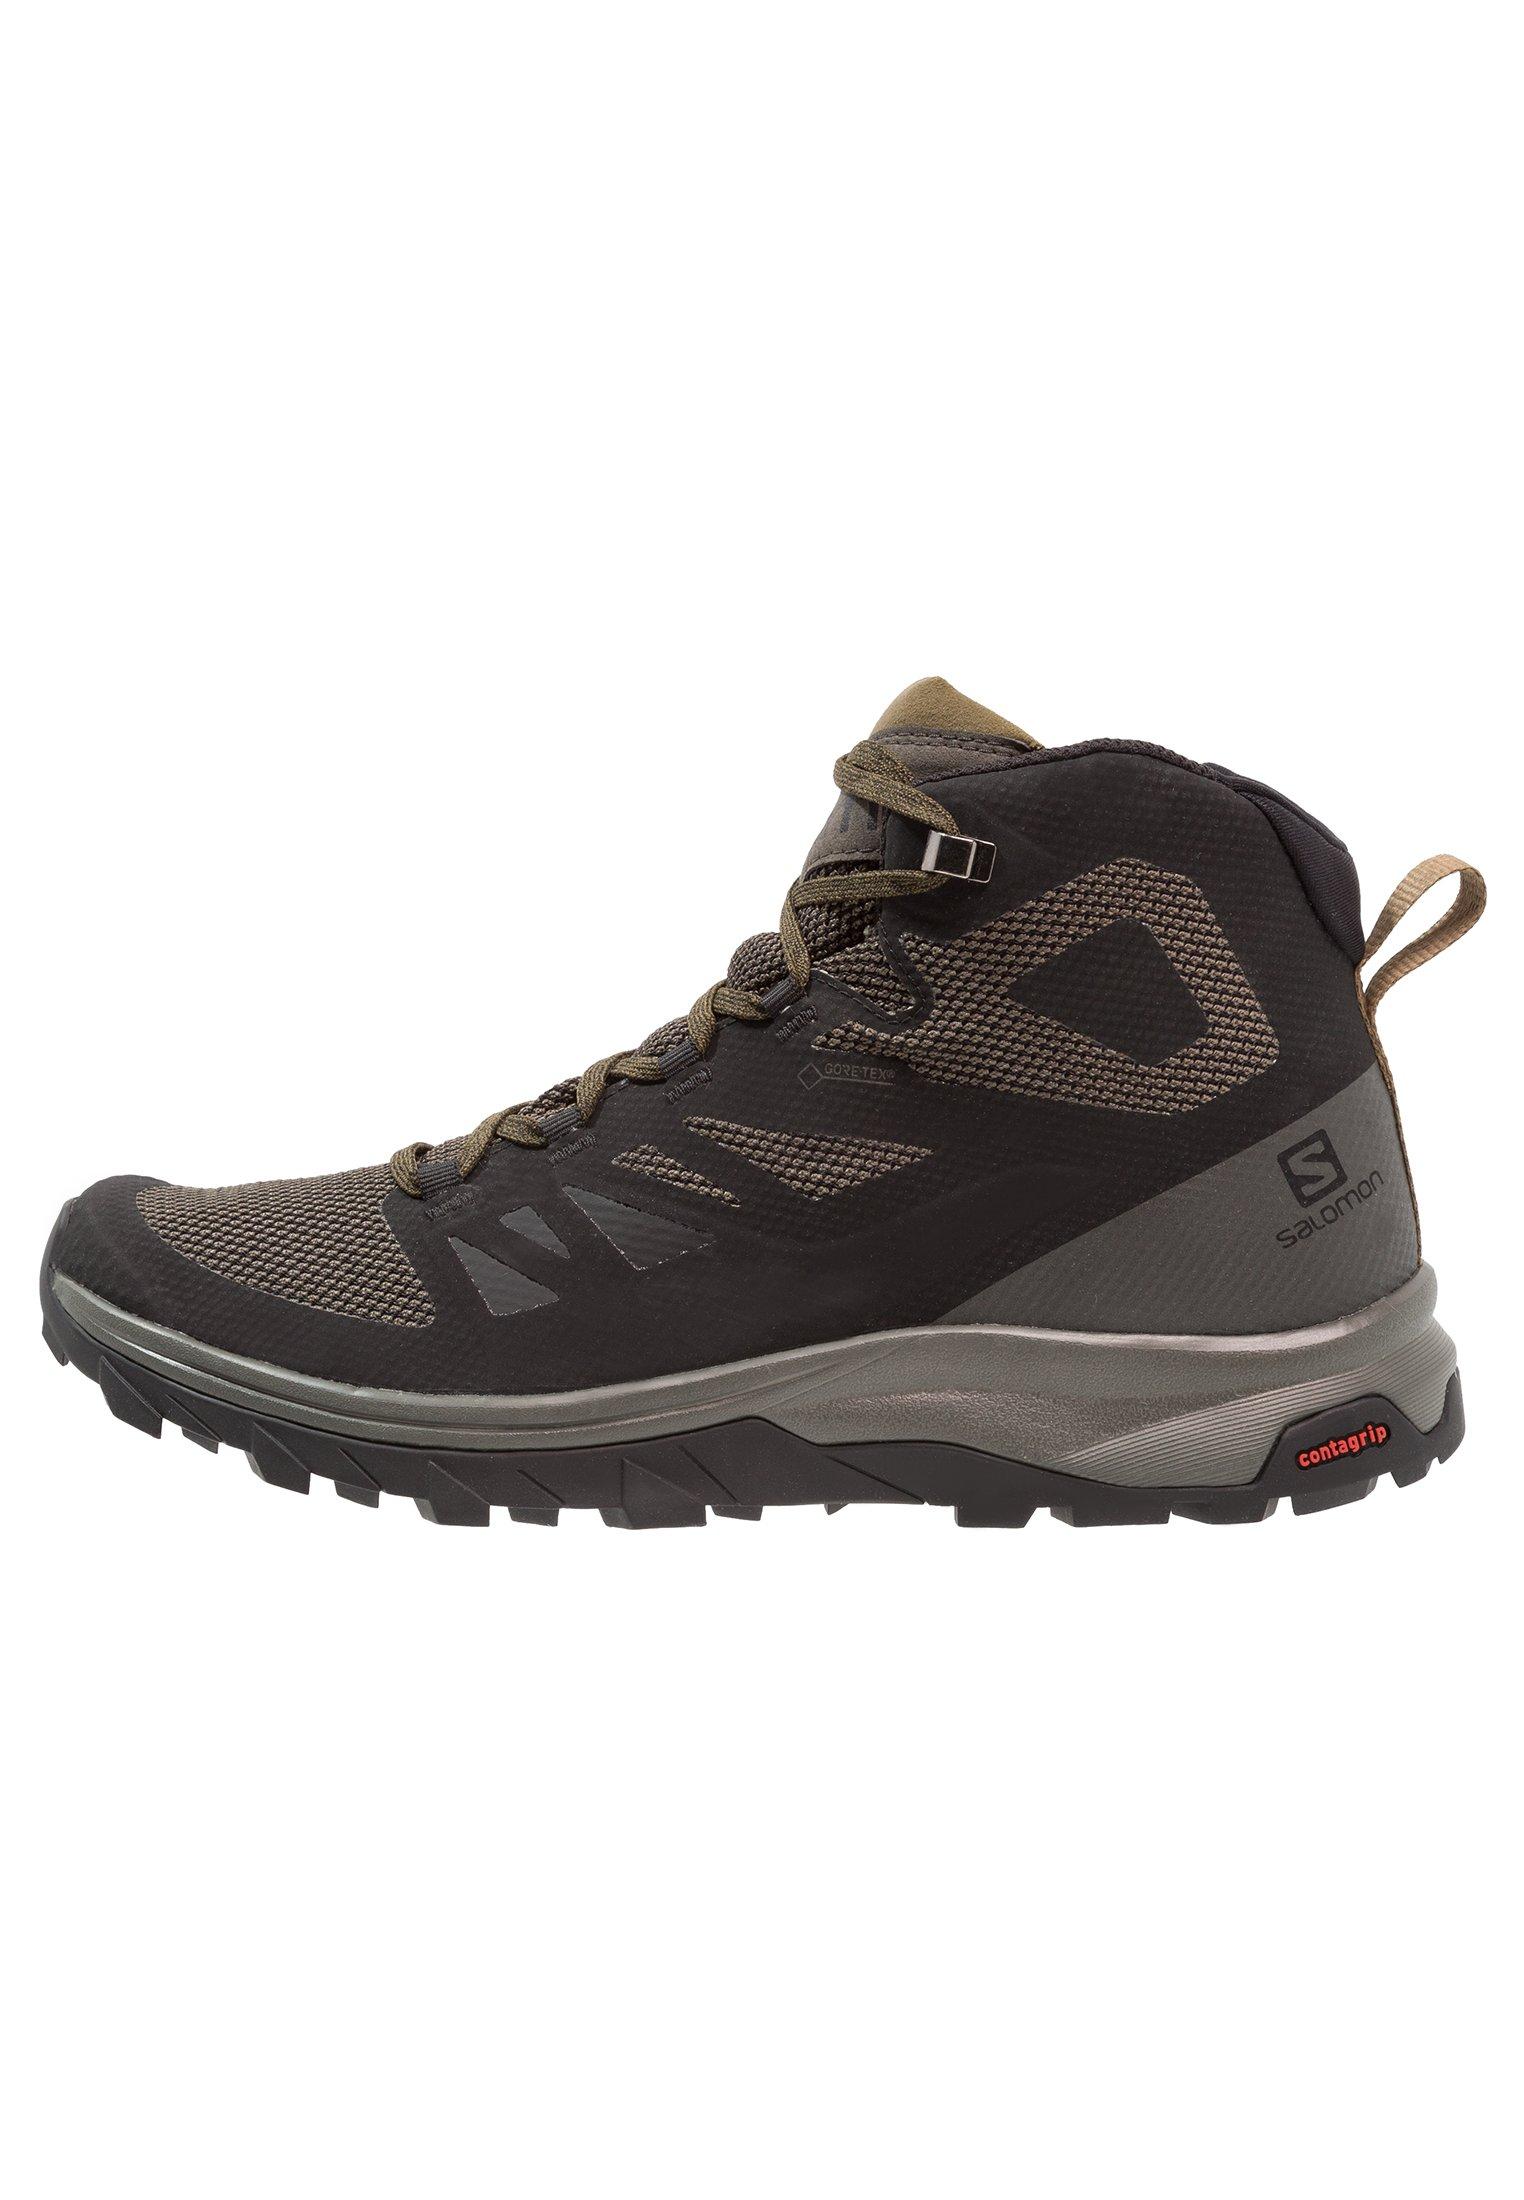 OUTLINE MID GTX Hikingskor blackbelugacapers